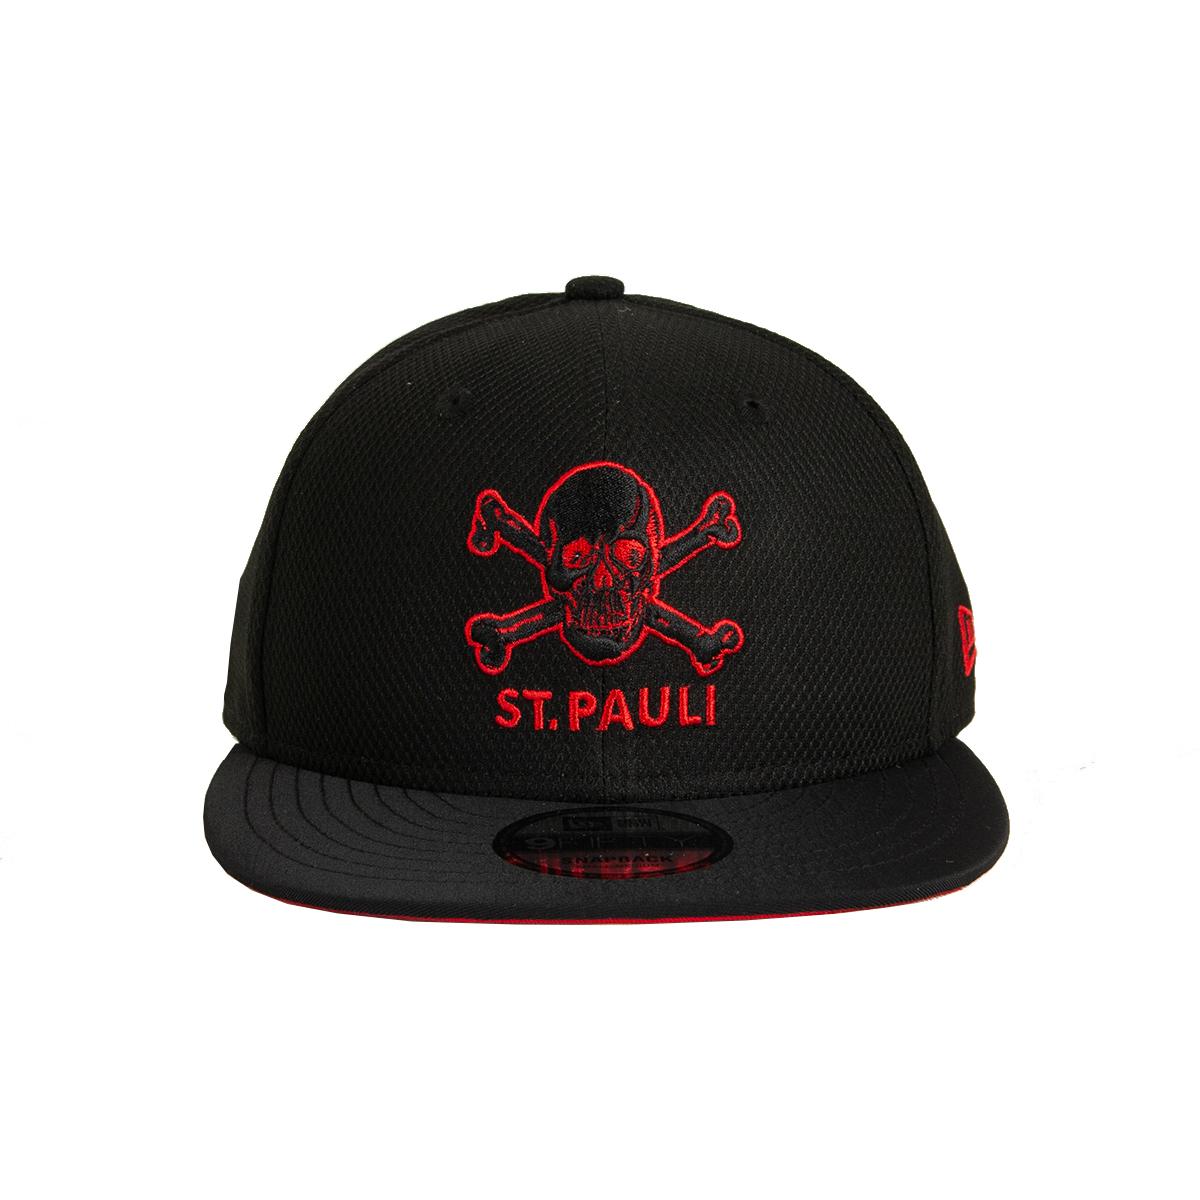 FC St. Pauli - Cap 9fifty Totenkopf Outline - schwarz